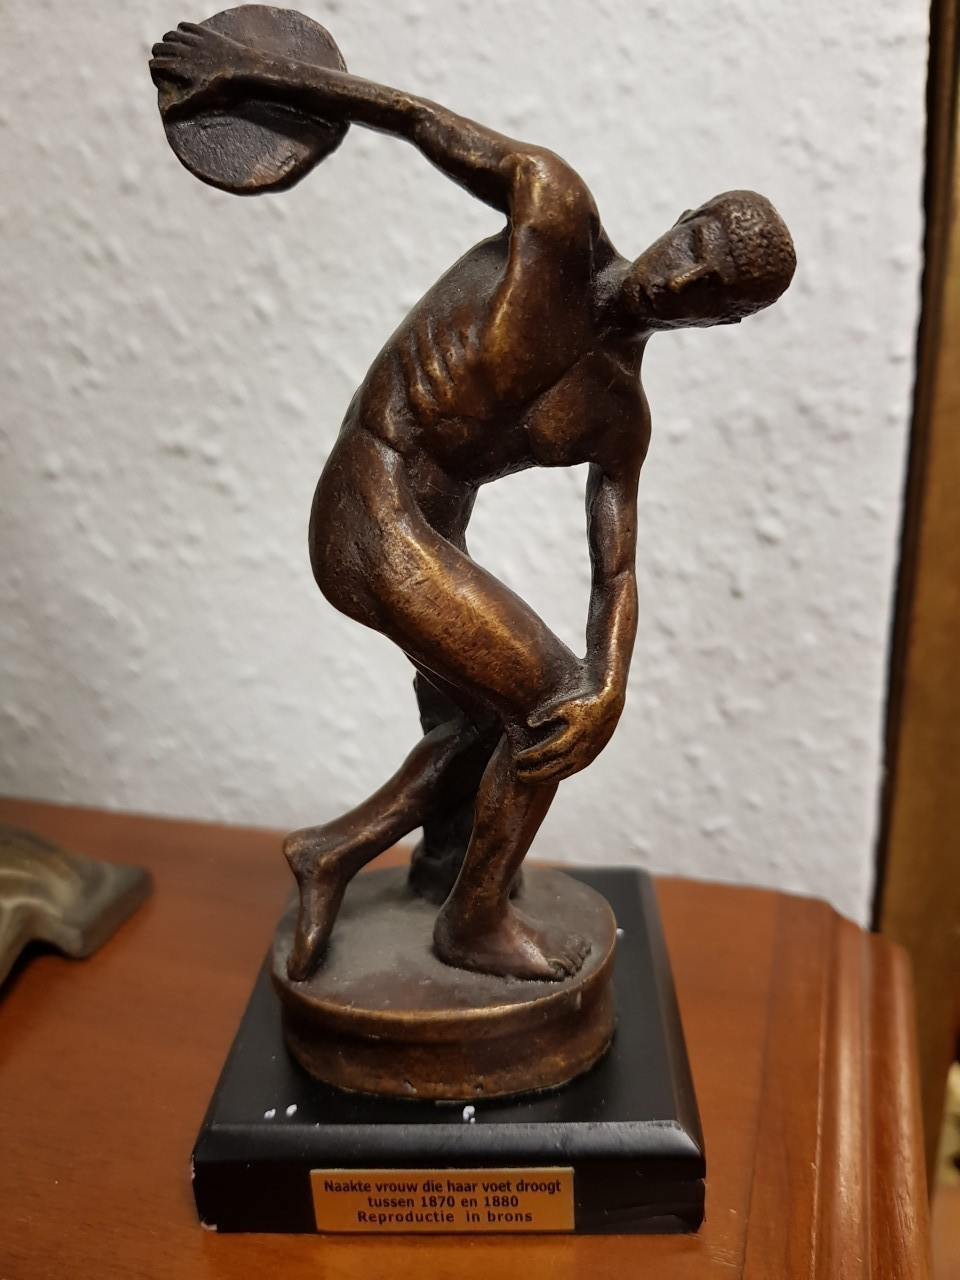 Bronz szobor reprodukció